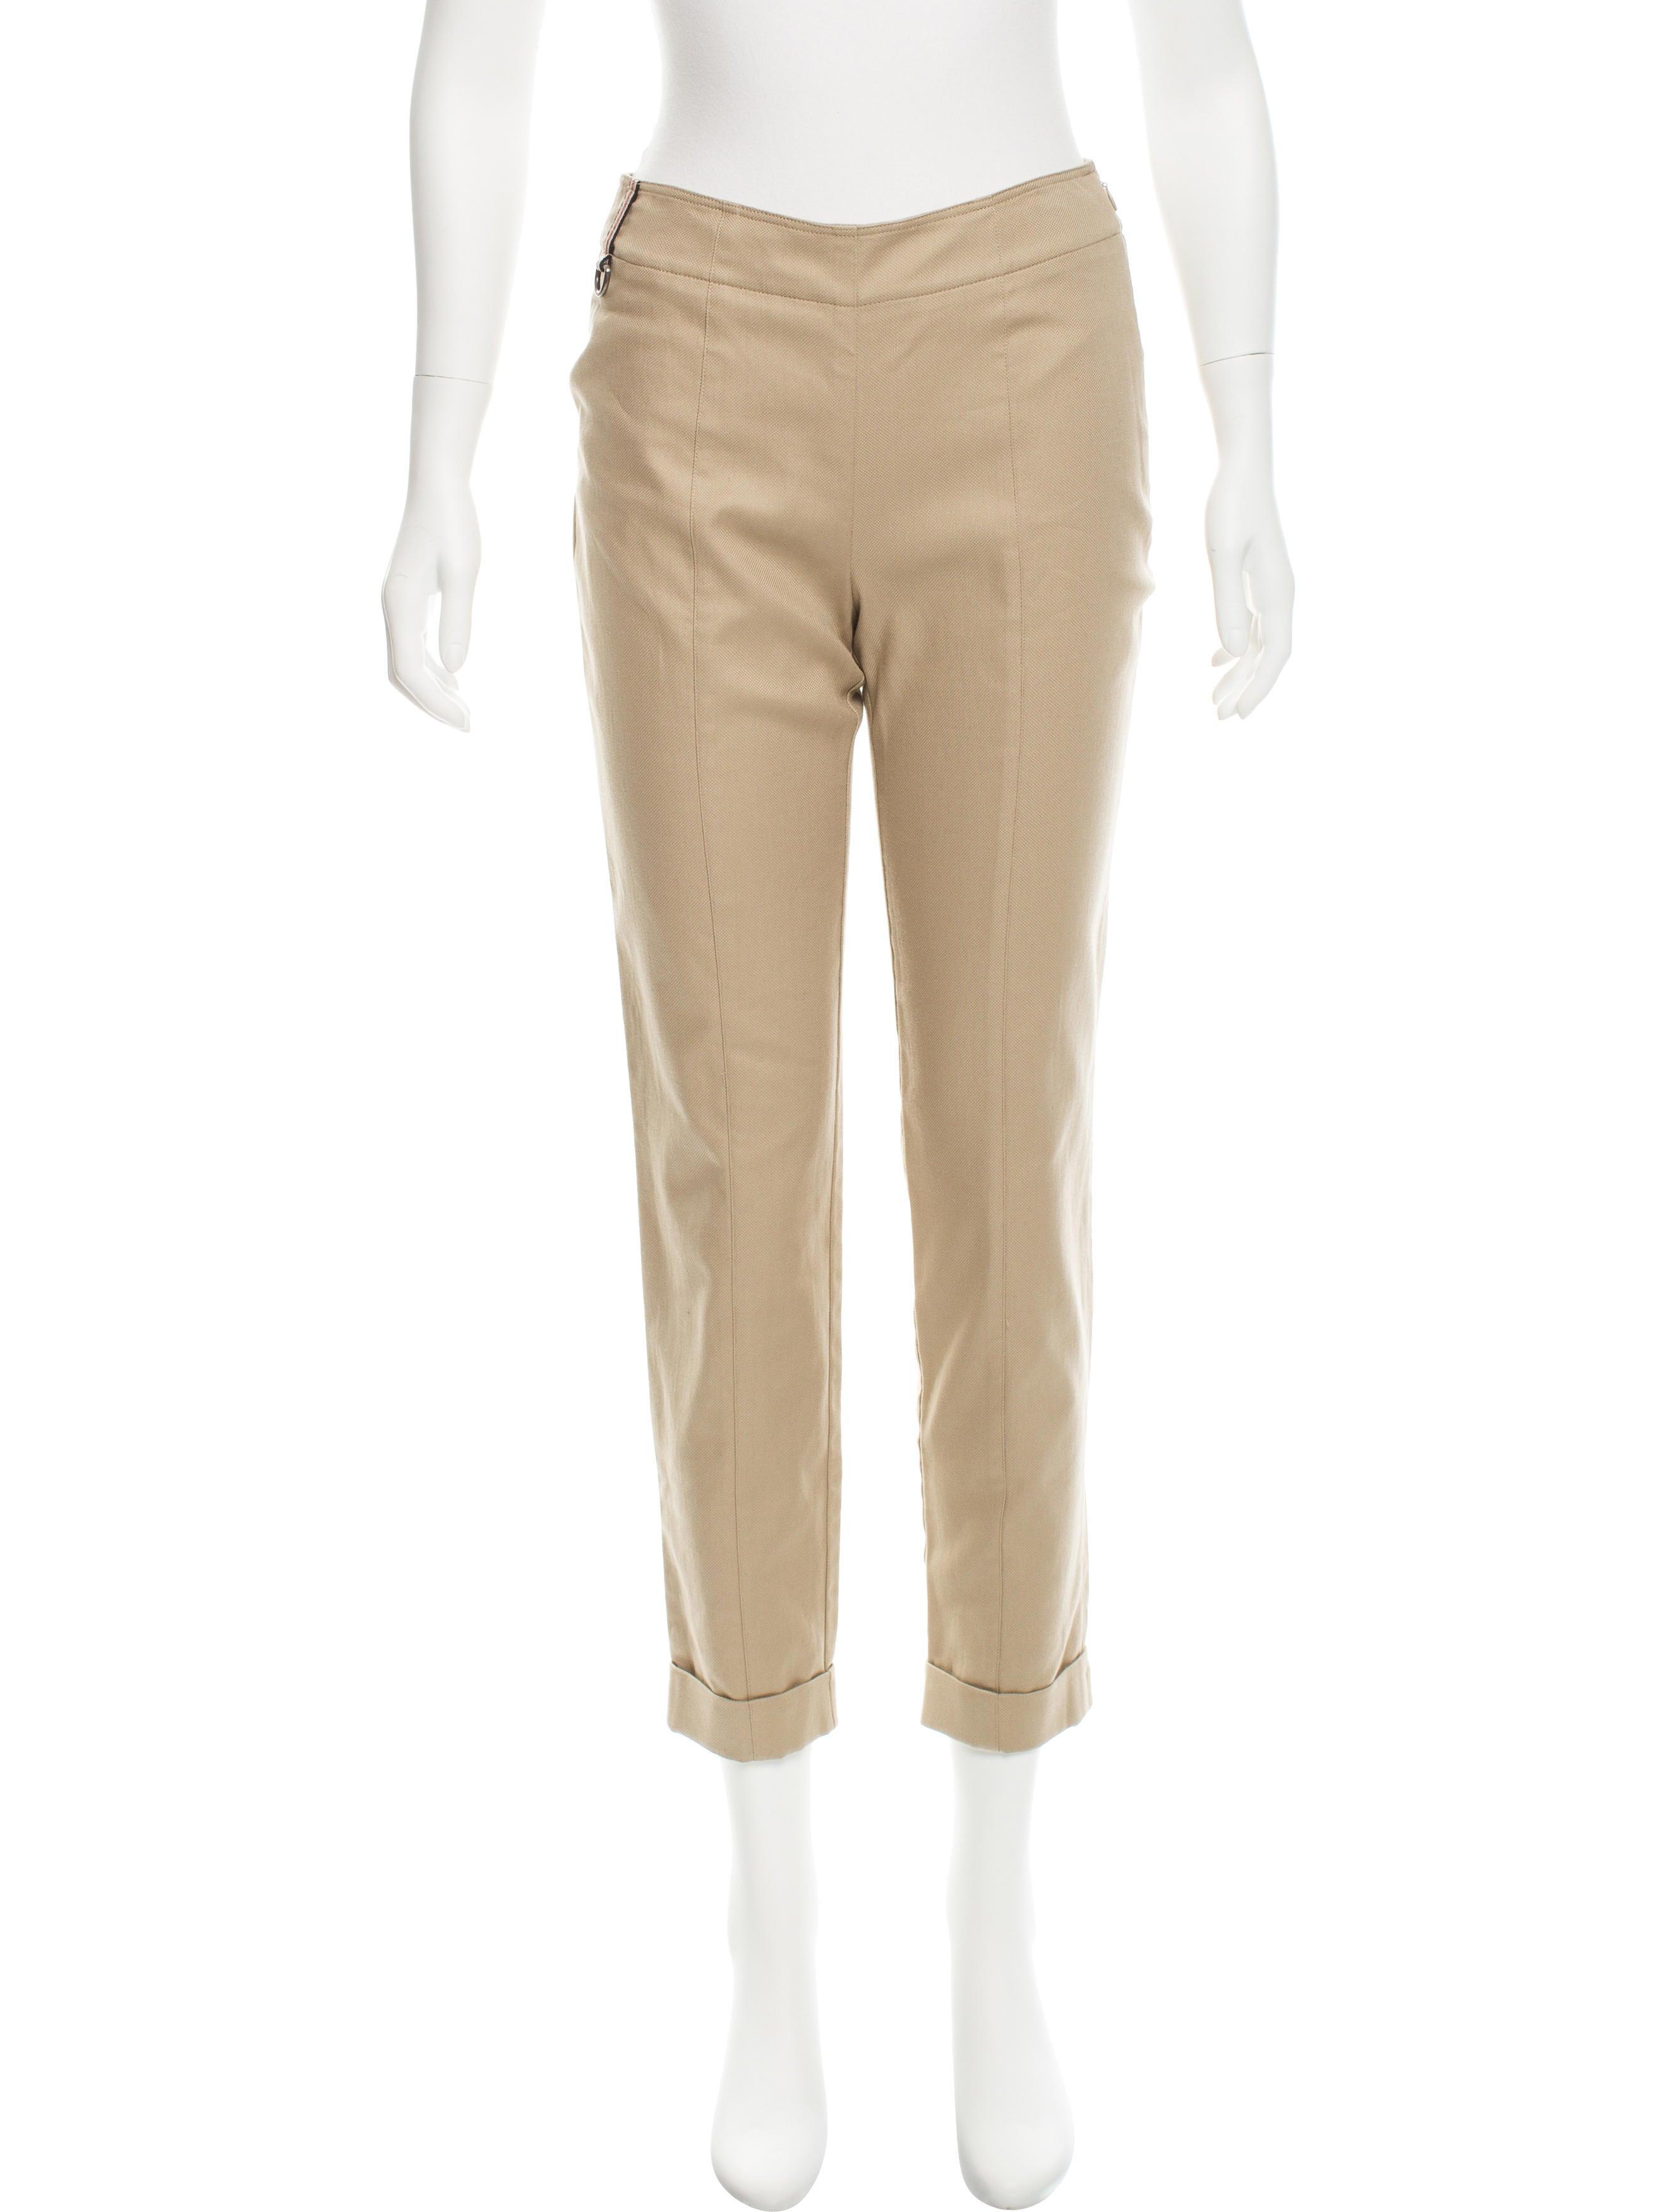 Luxury Darjoni Dress Cuff Pants For Women 17421  Save 63